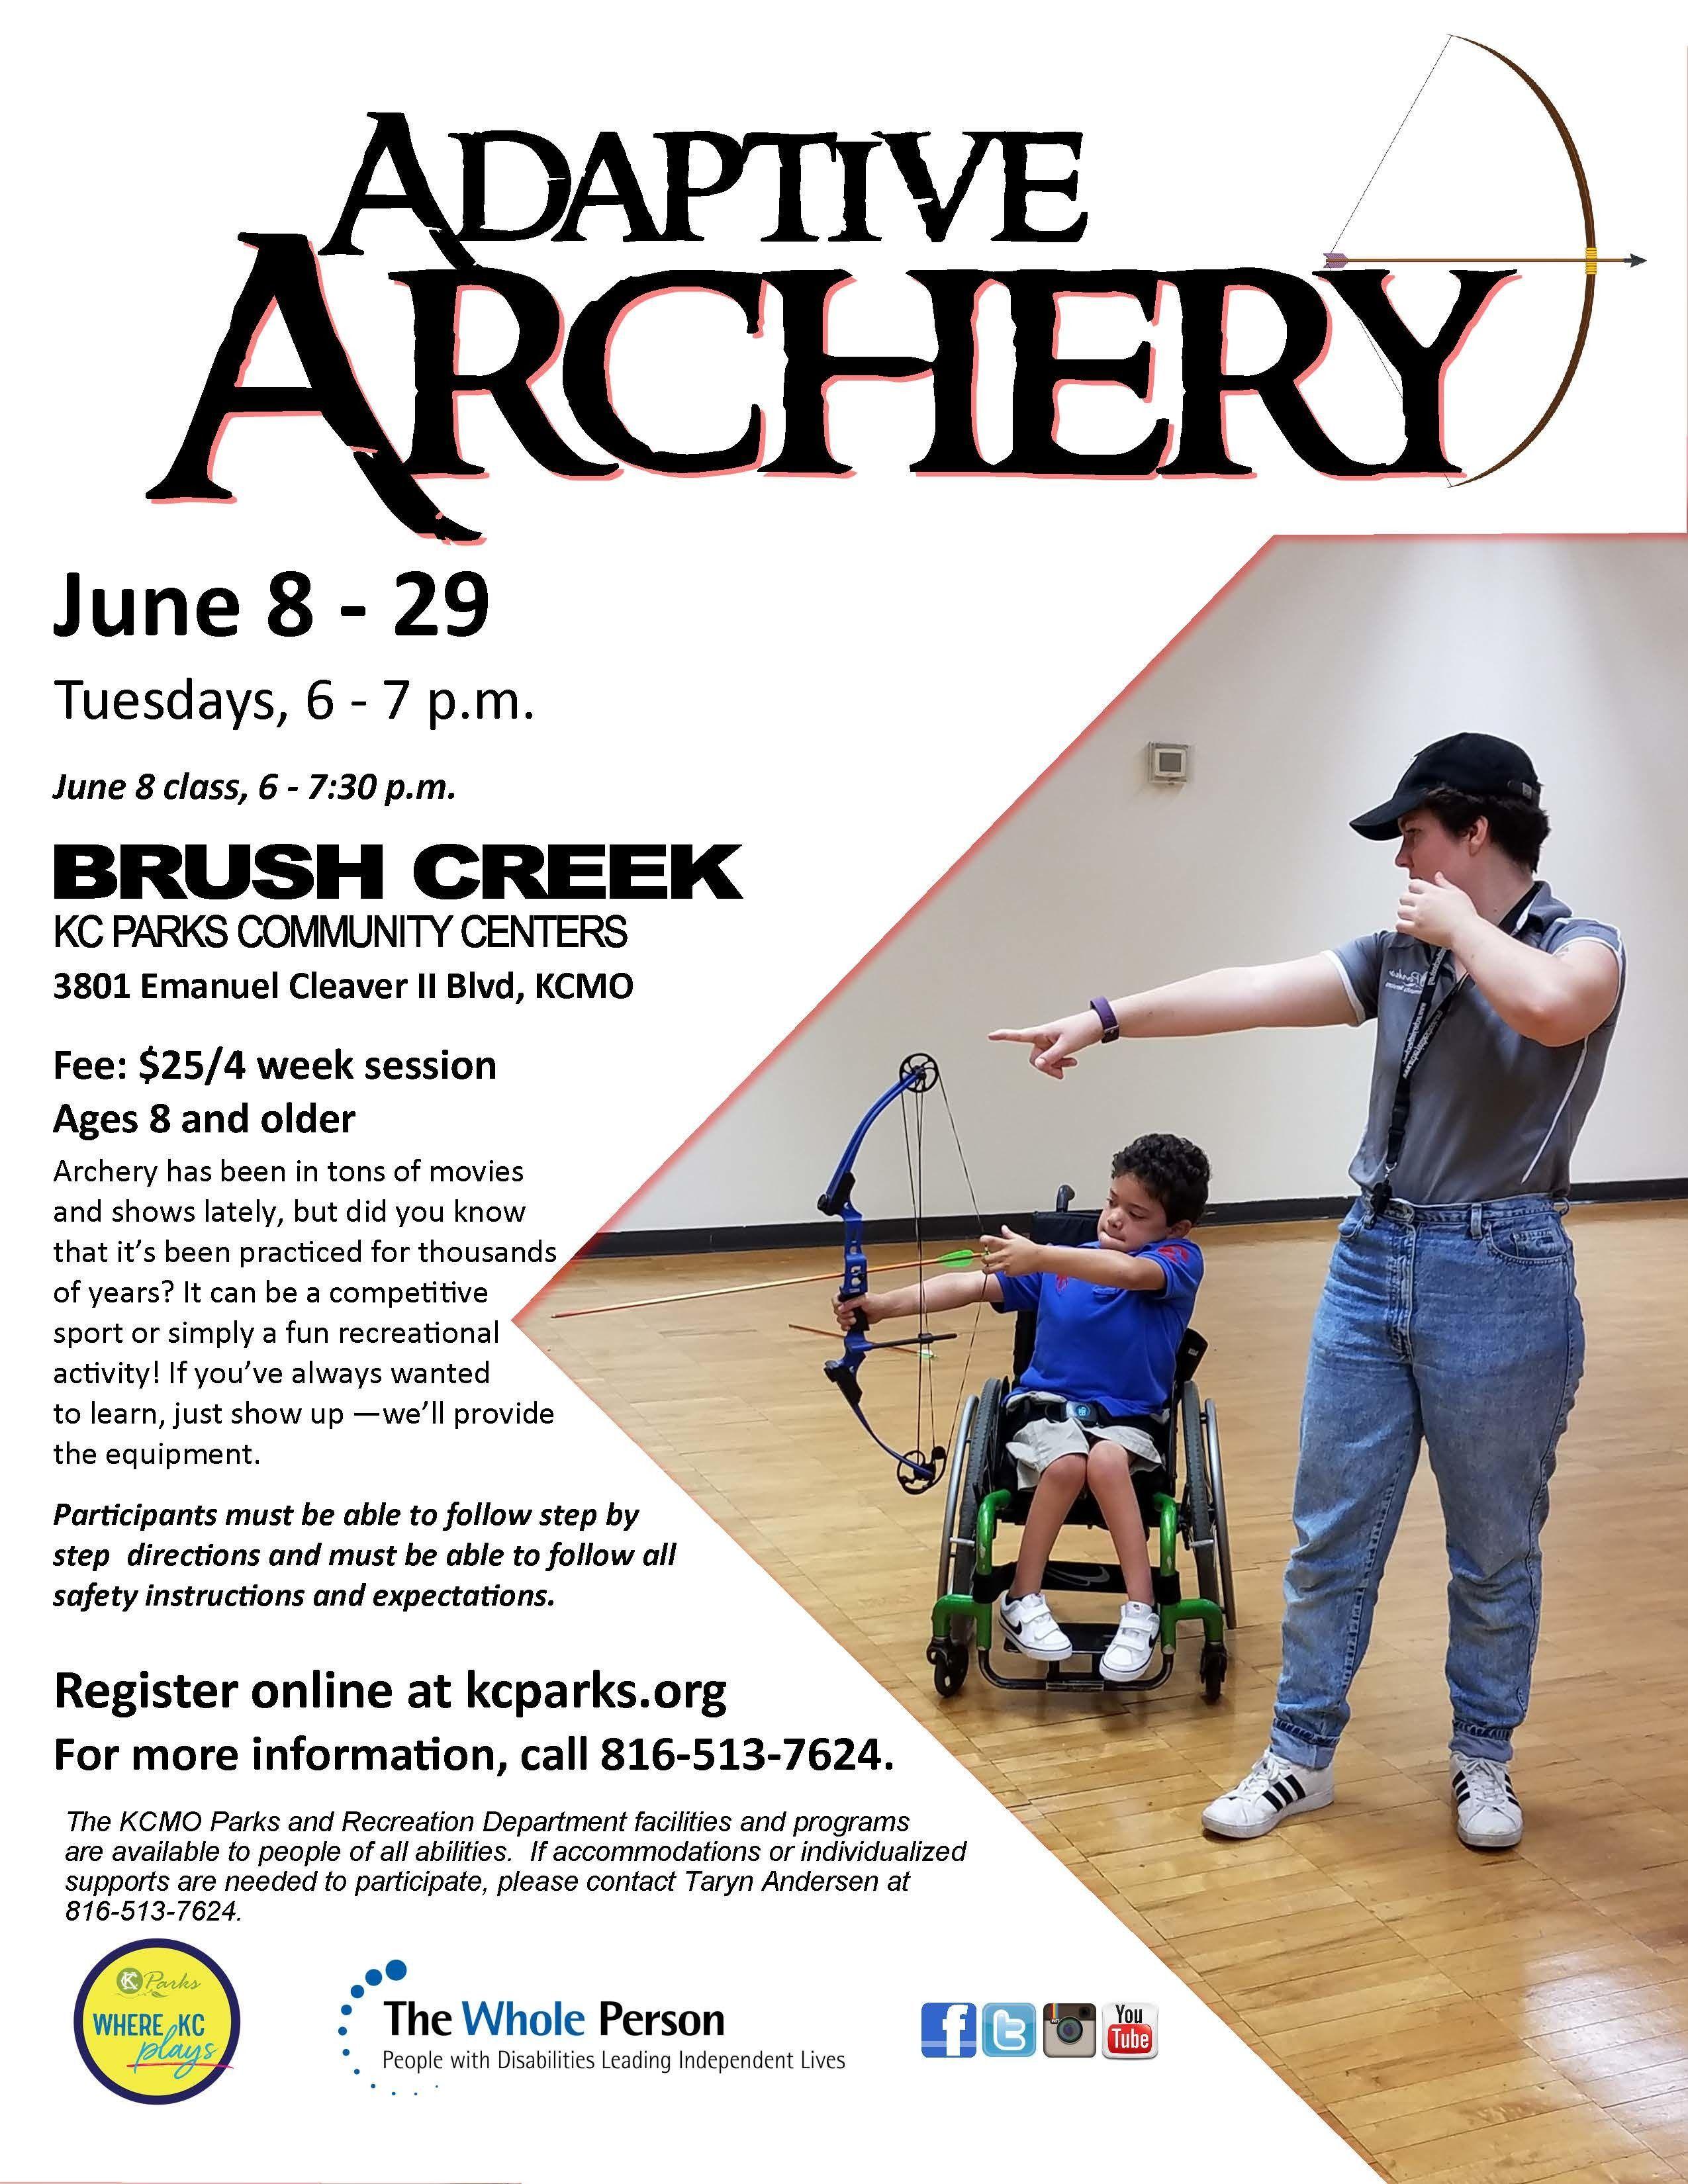 Image of flyer advertising Adaptive Archery workshop